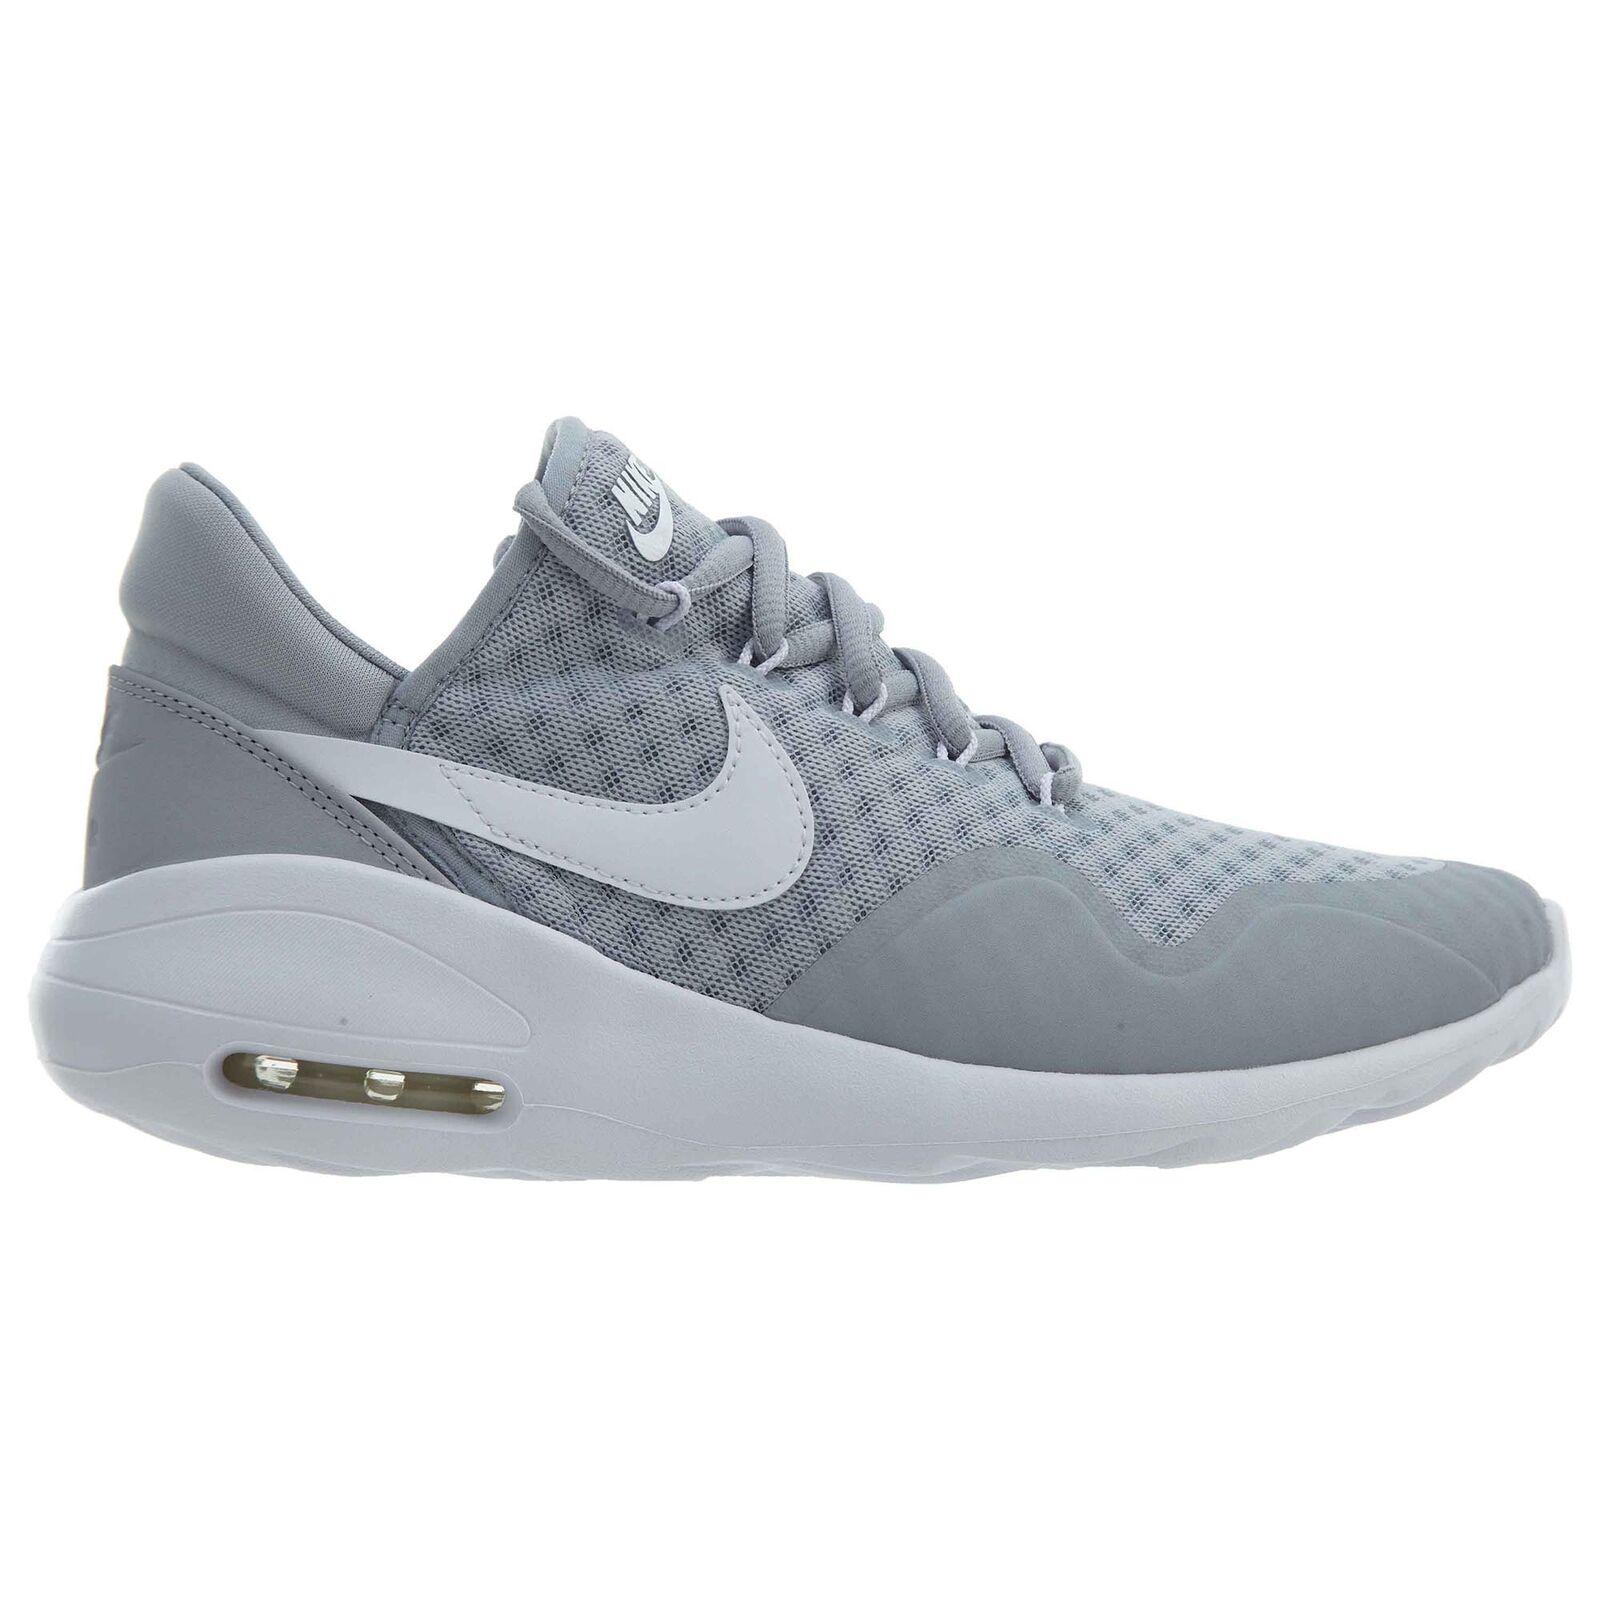 Nike Wolf Air Max Sasha Womens 916783-002 Wolf Nike Grey White Training Shoes Size 7.5 9bddc4